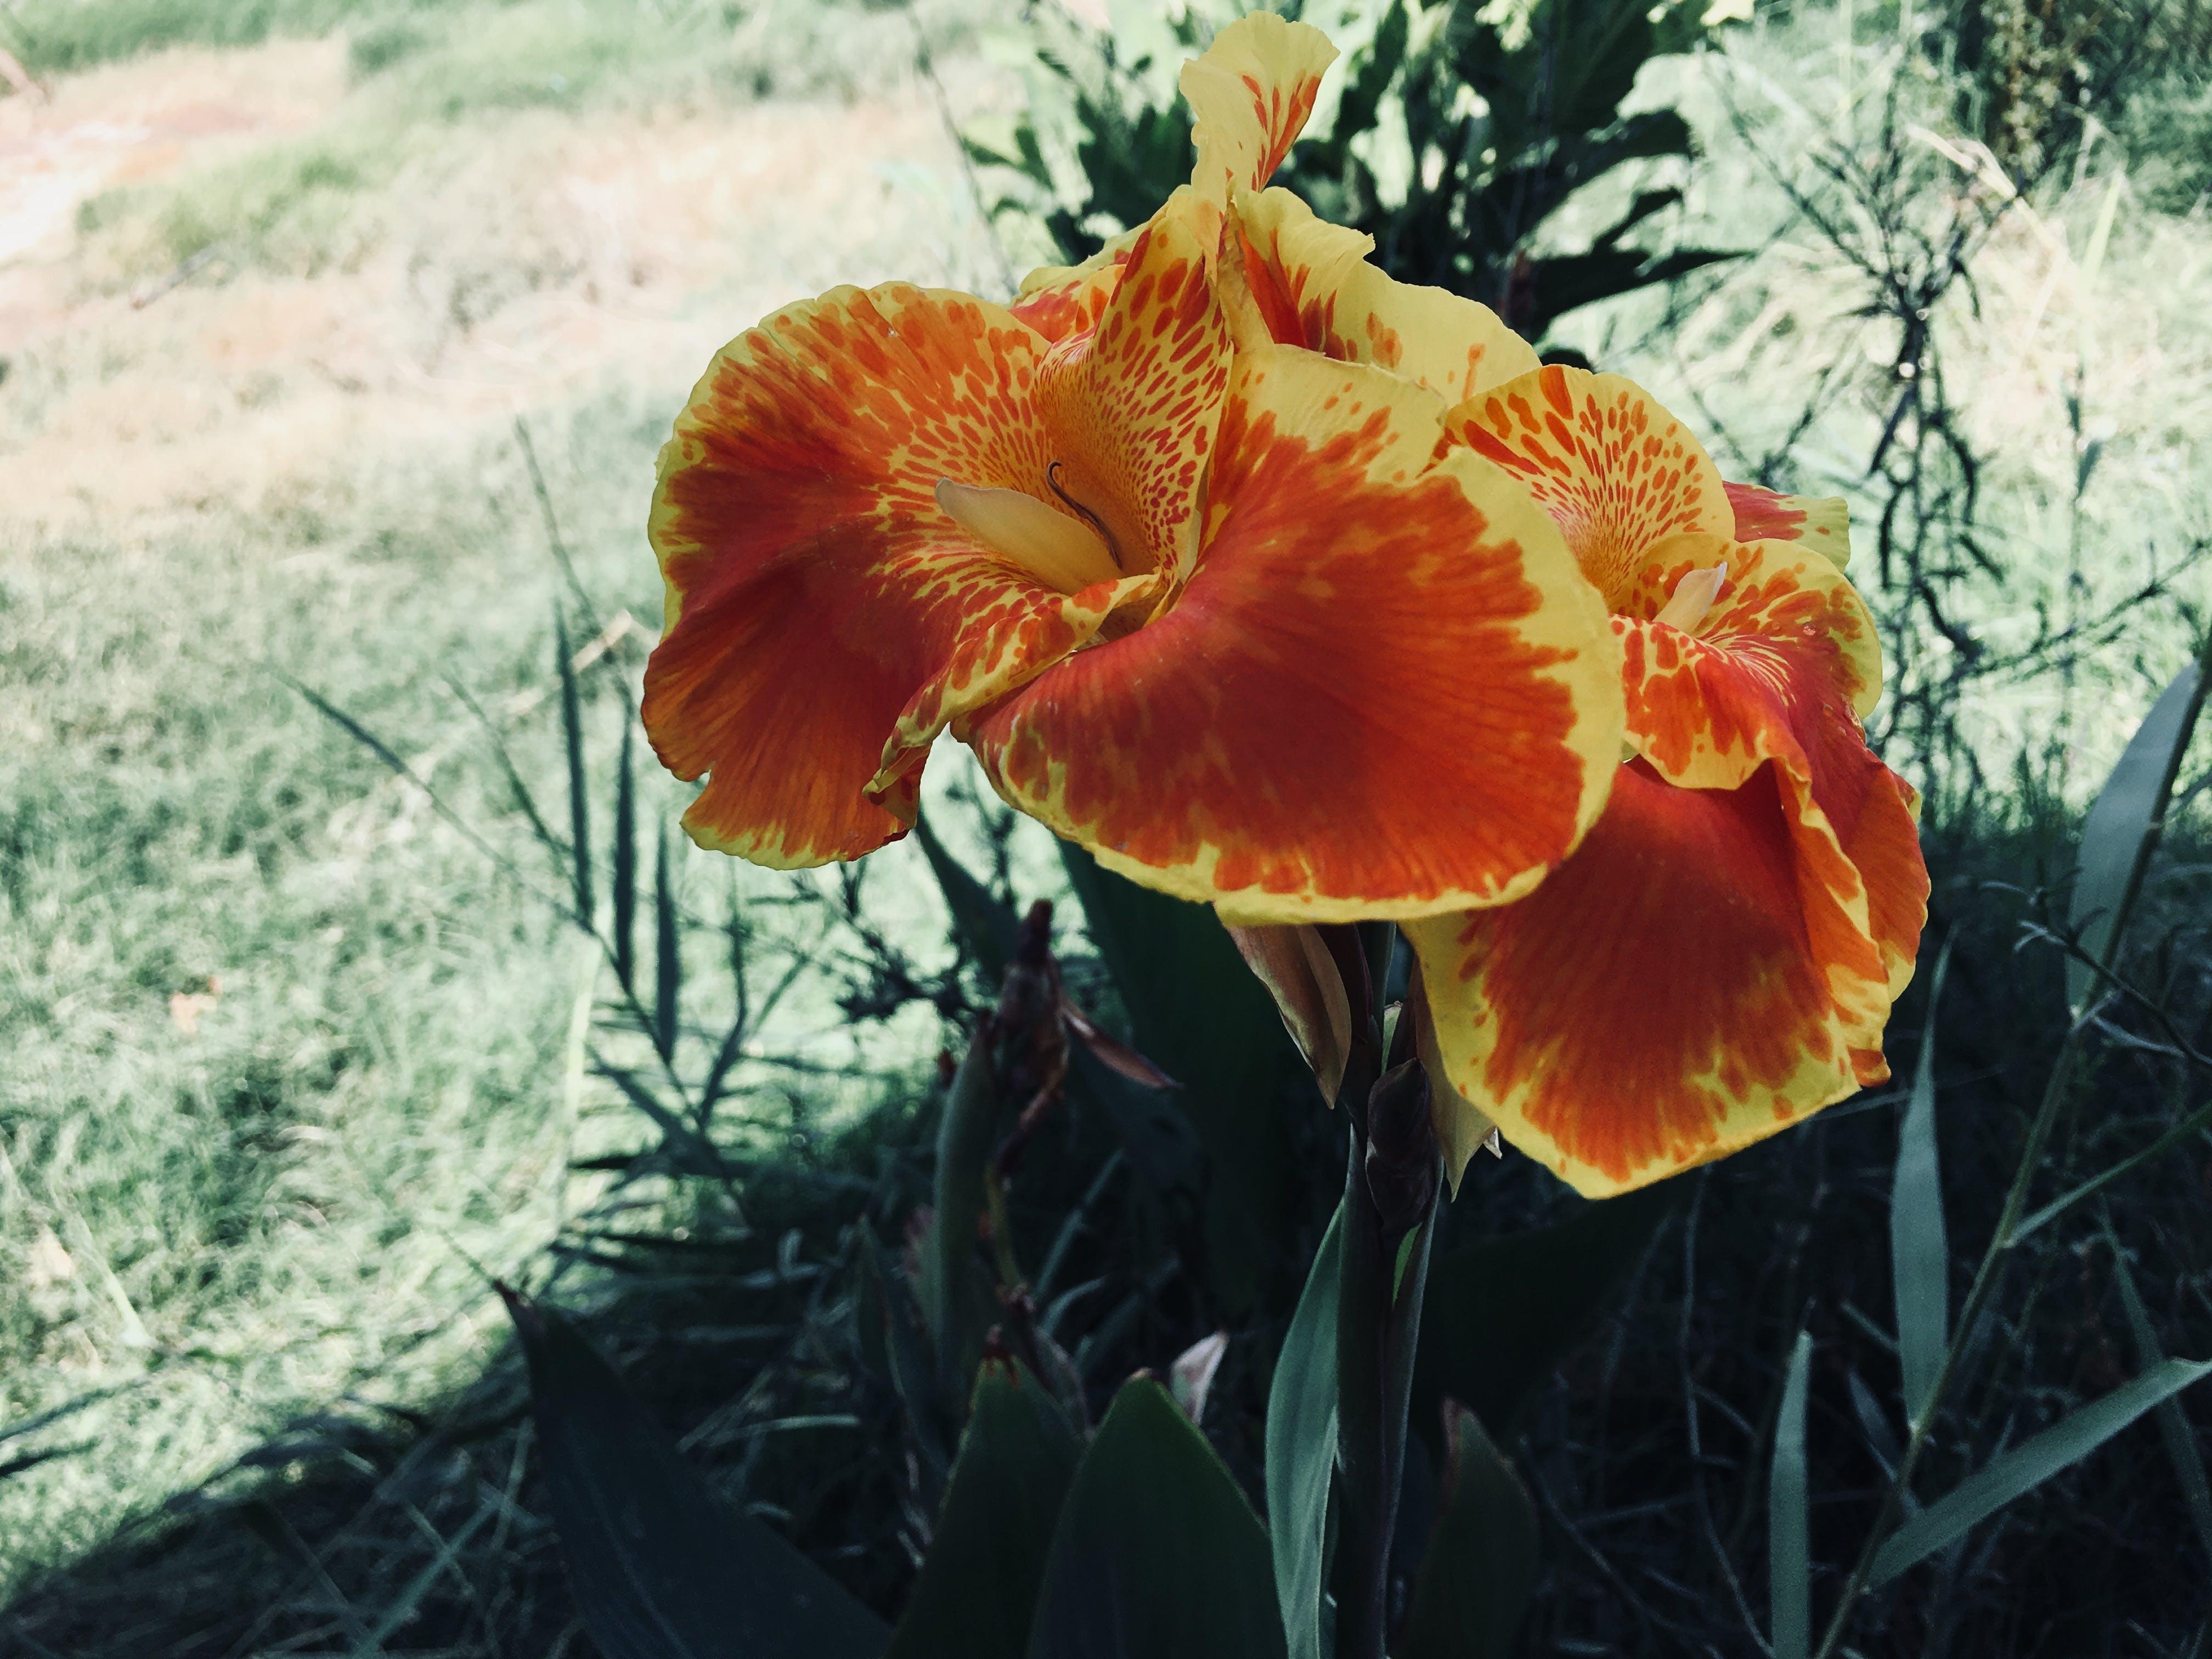 Free stock photo of artificial flowers, drama, garden, garden plant